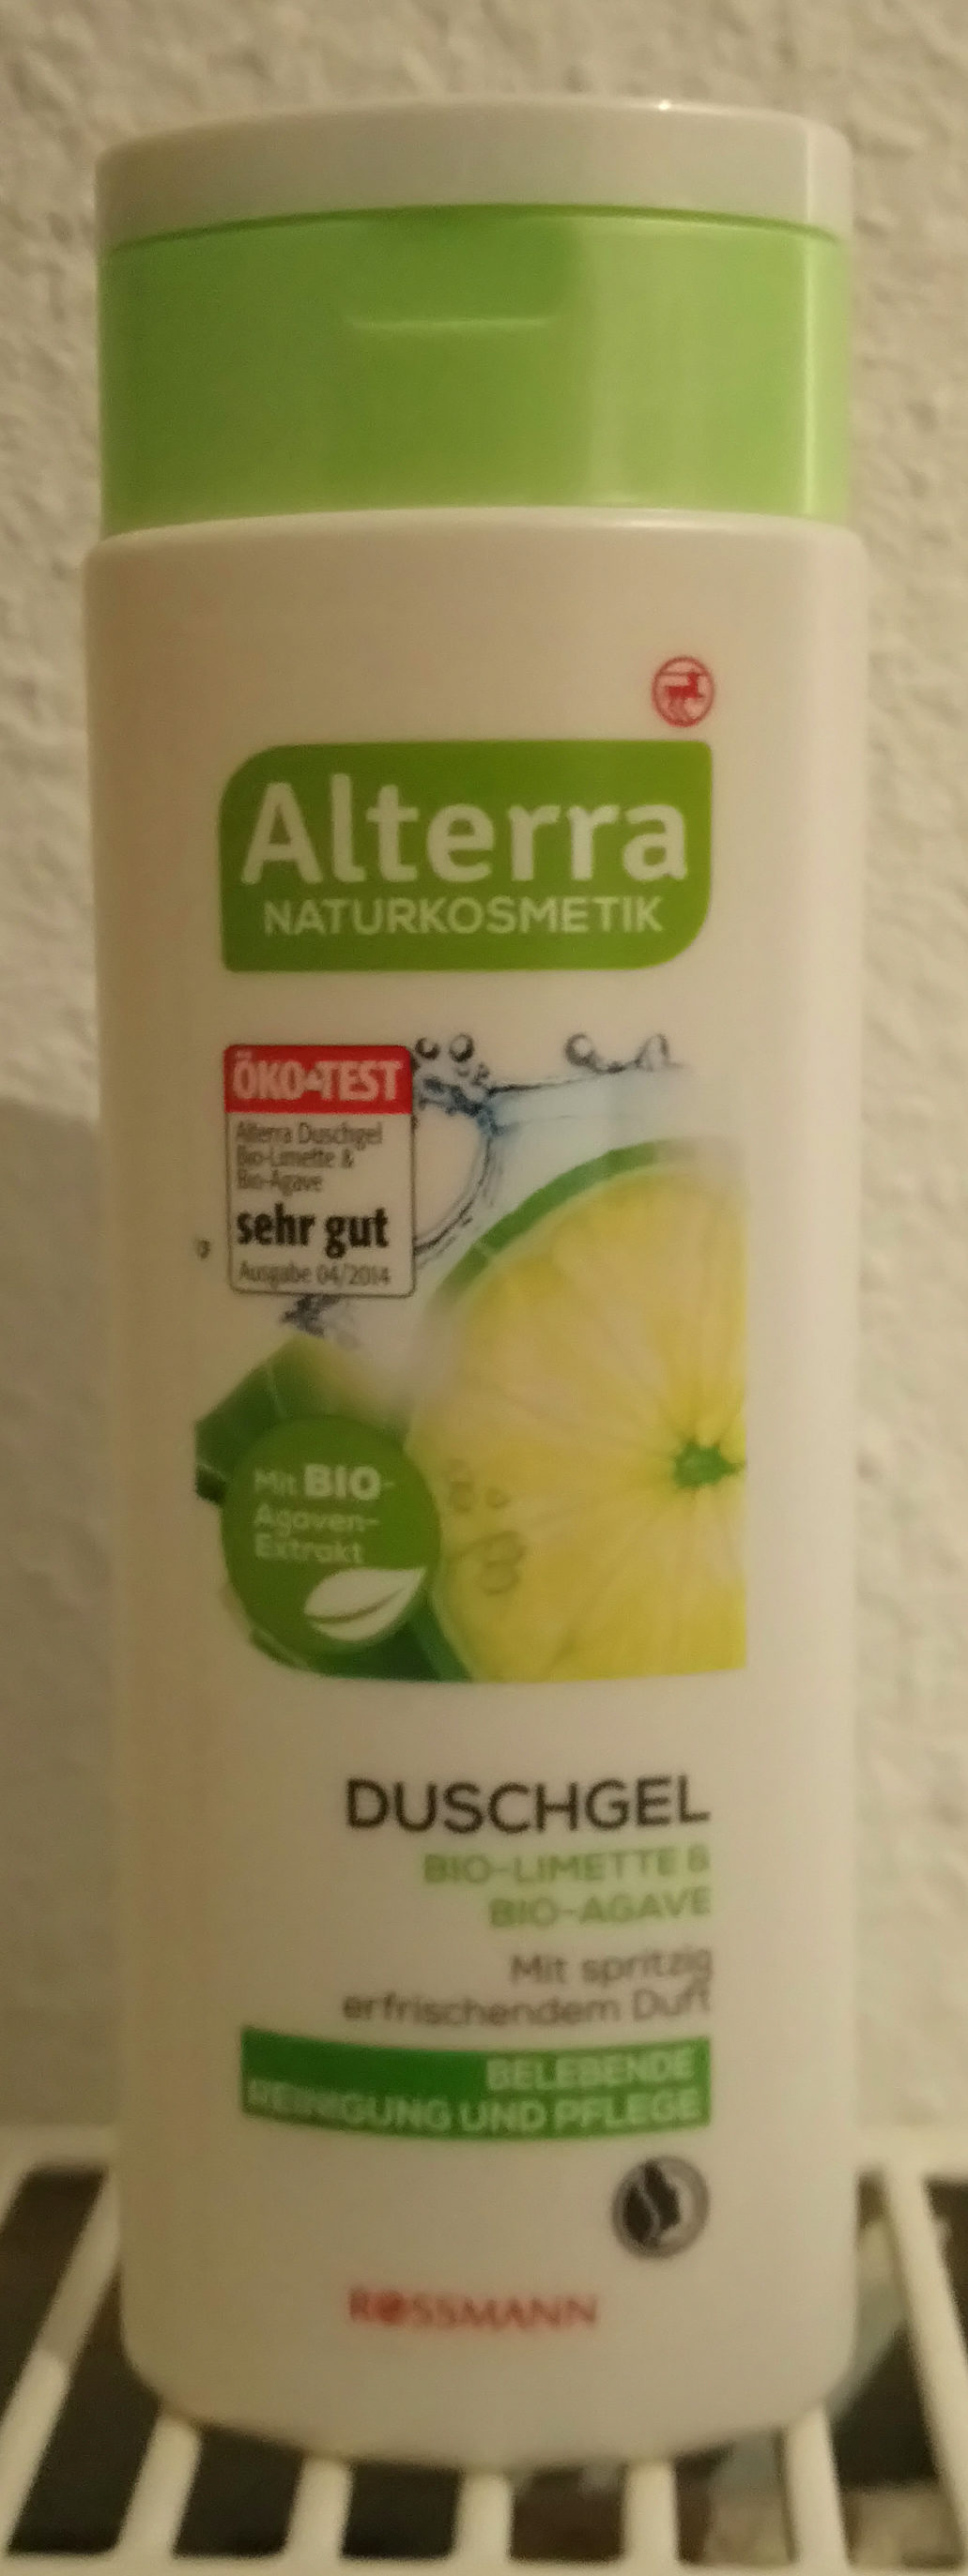 Duschgel Bio-Limette & Bio-Agave - Product